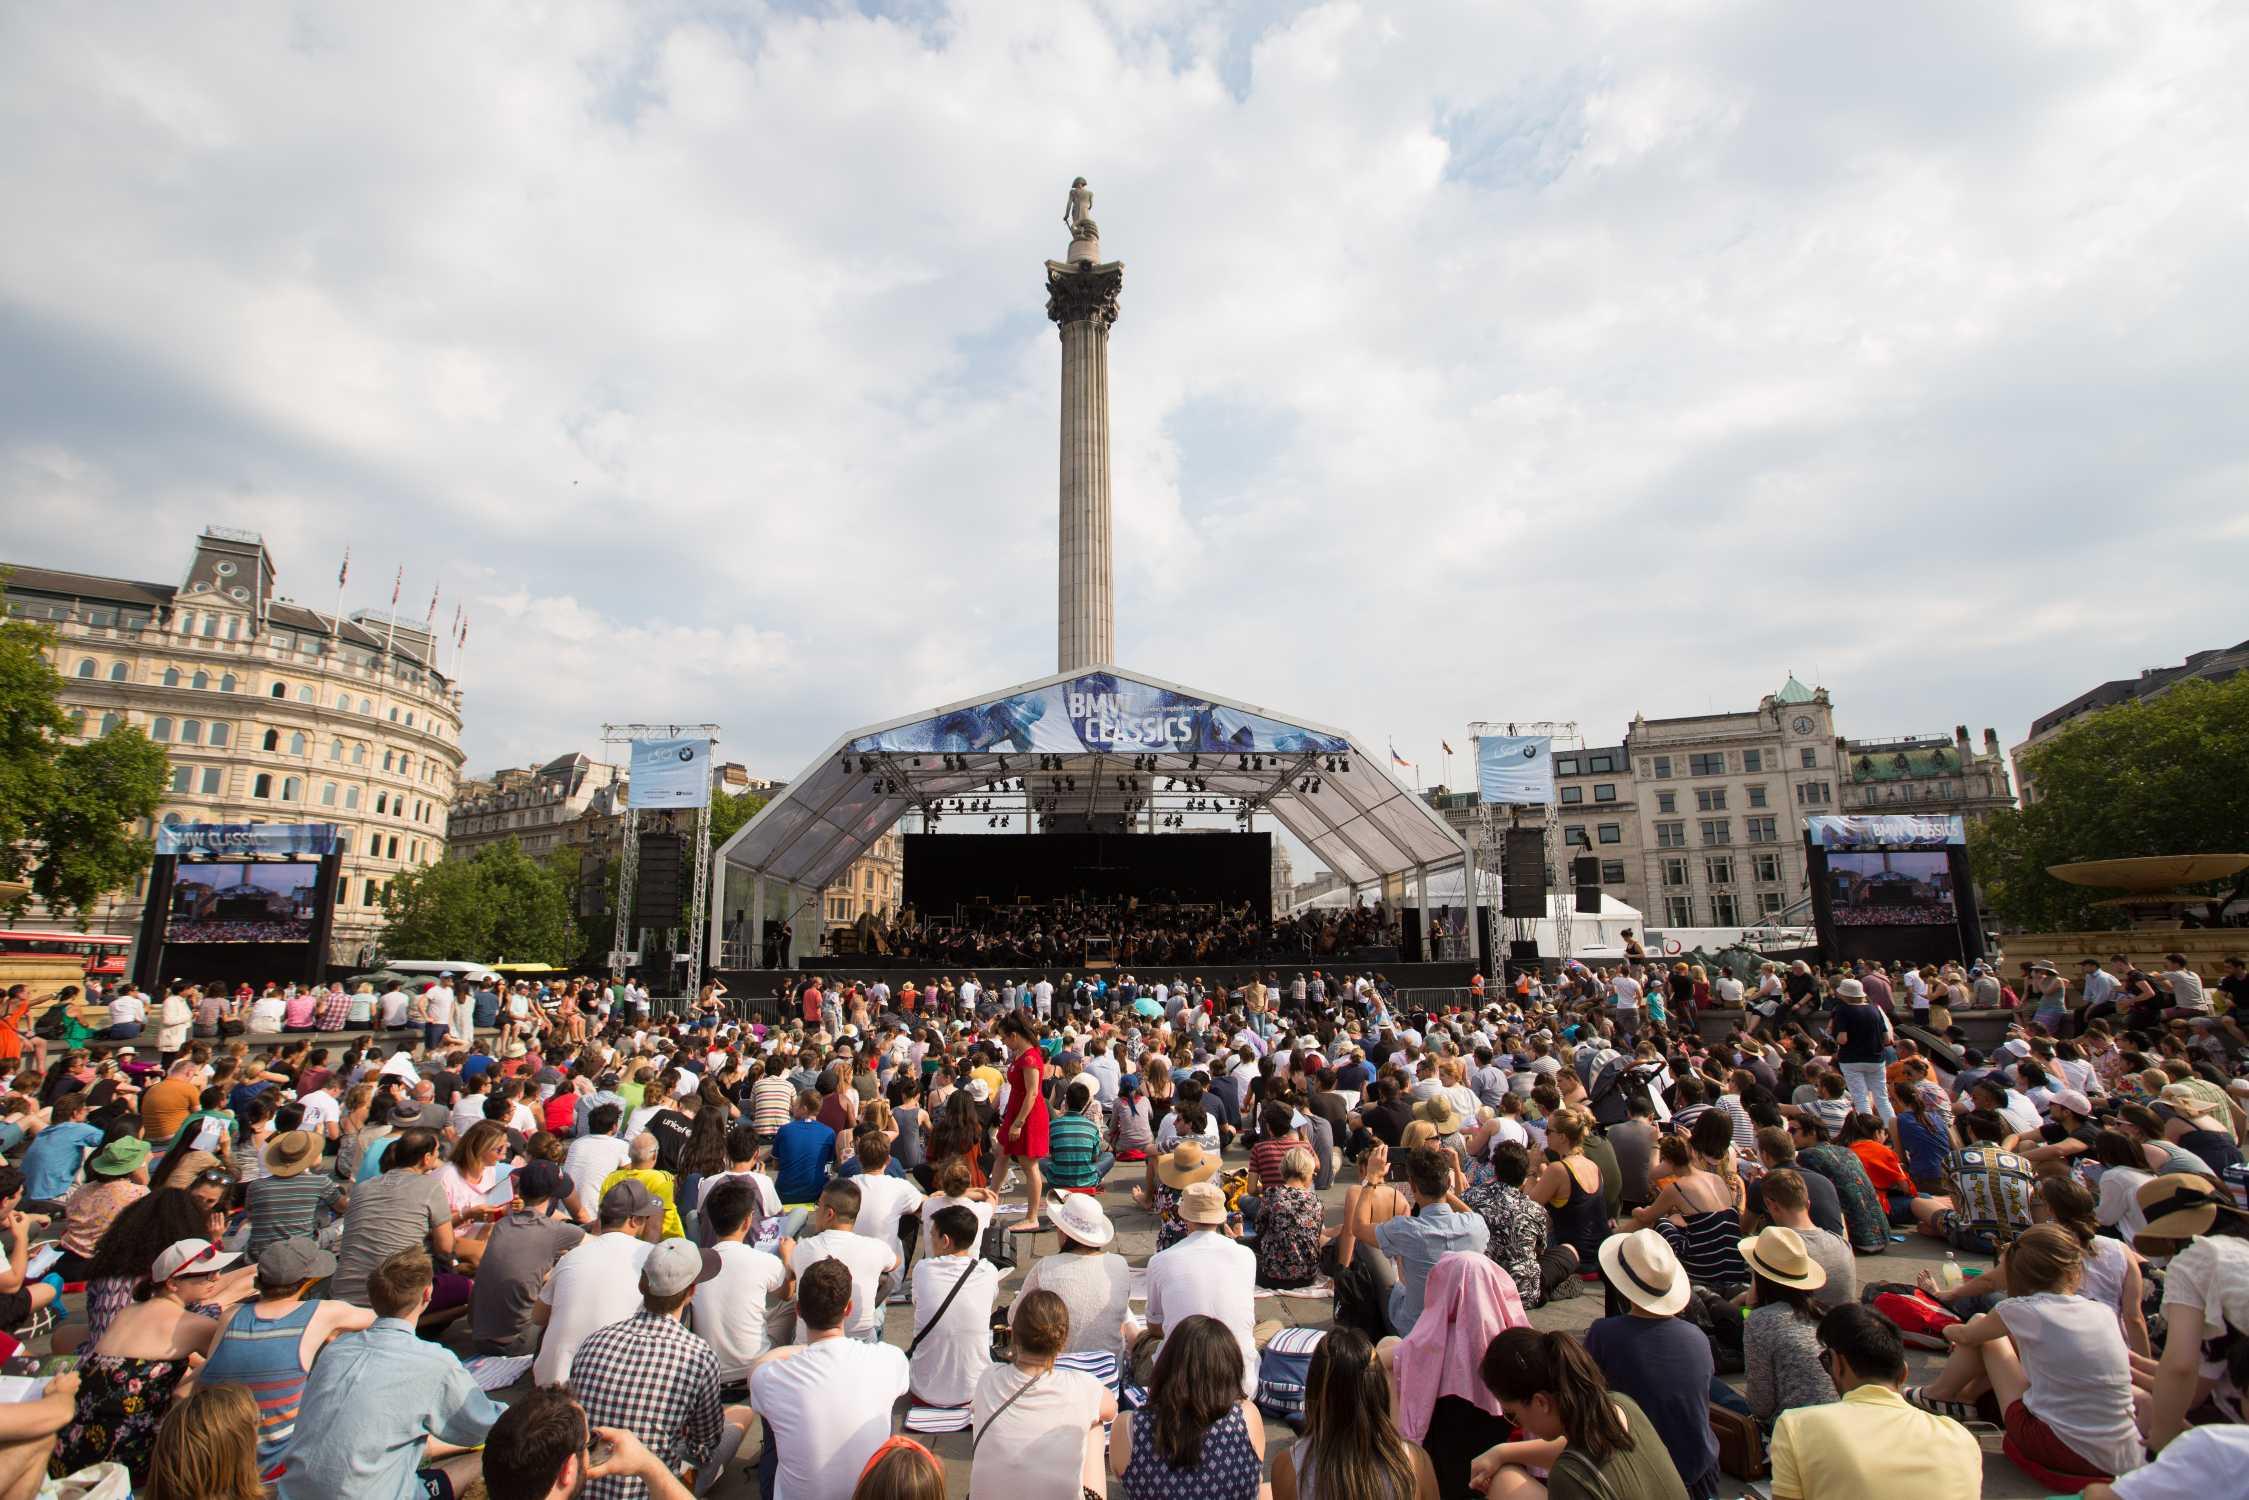 concert in aer liber BMW CLASSICS, Trafalgar Square